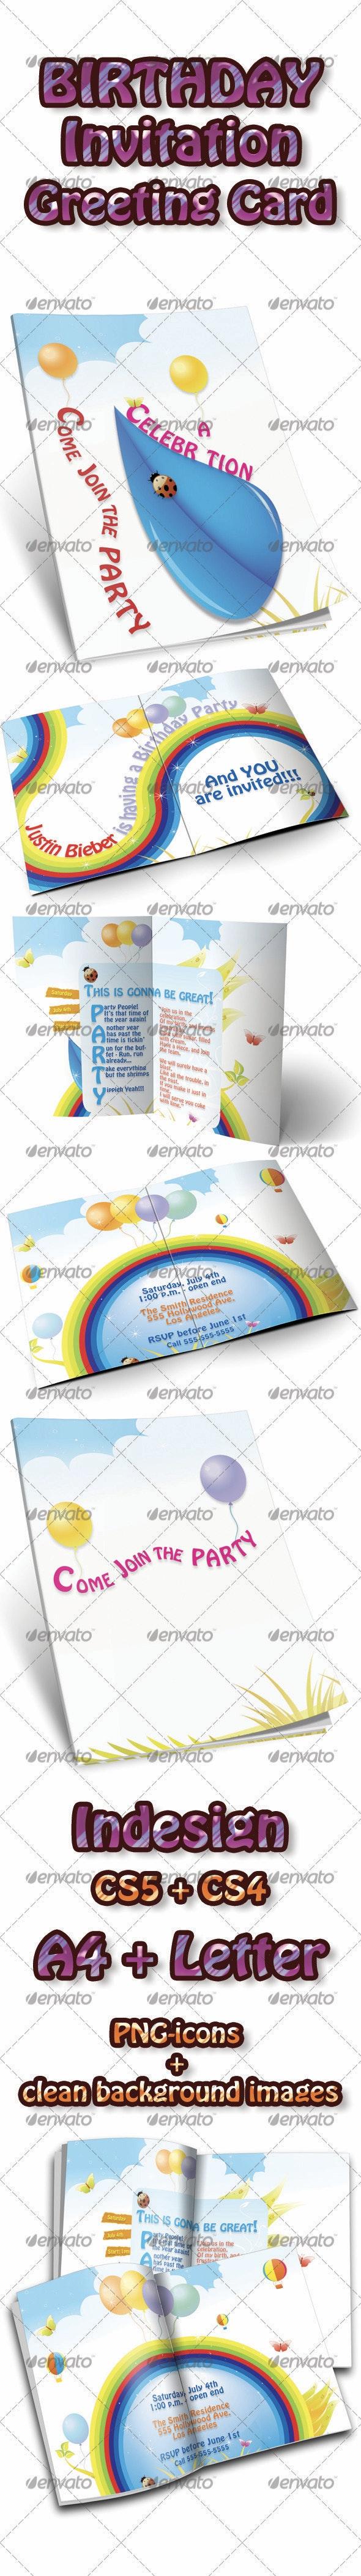 Rainbow Warrior - Birthday Greeting Card - Birthday Greeting Cards